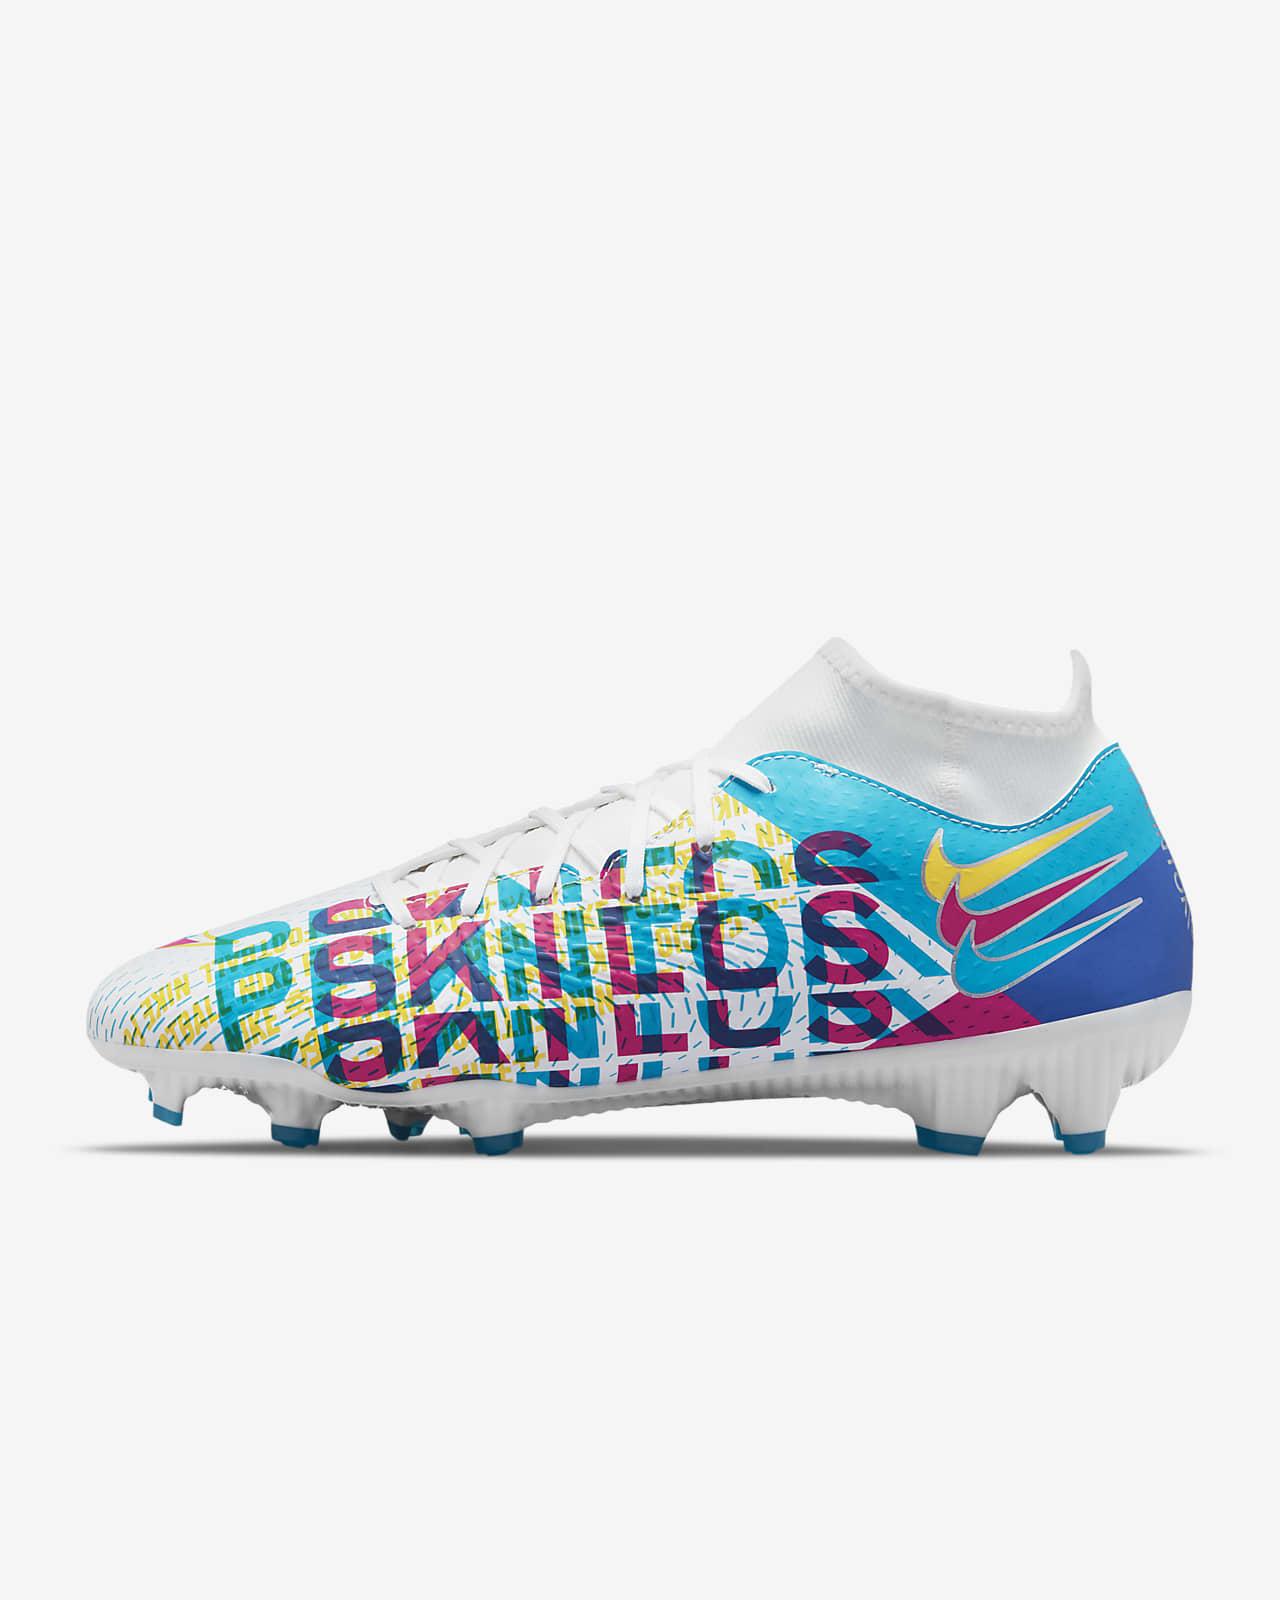 Nike Phantom GT Academy Dynamic Fit 3D MG Multi-Ground Football Boot